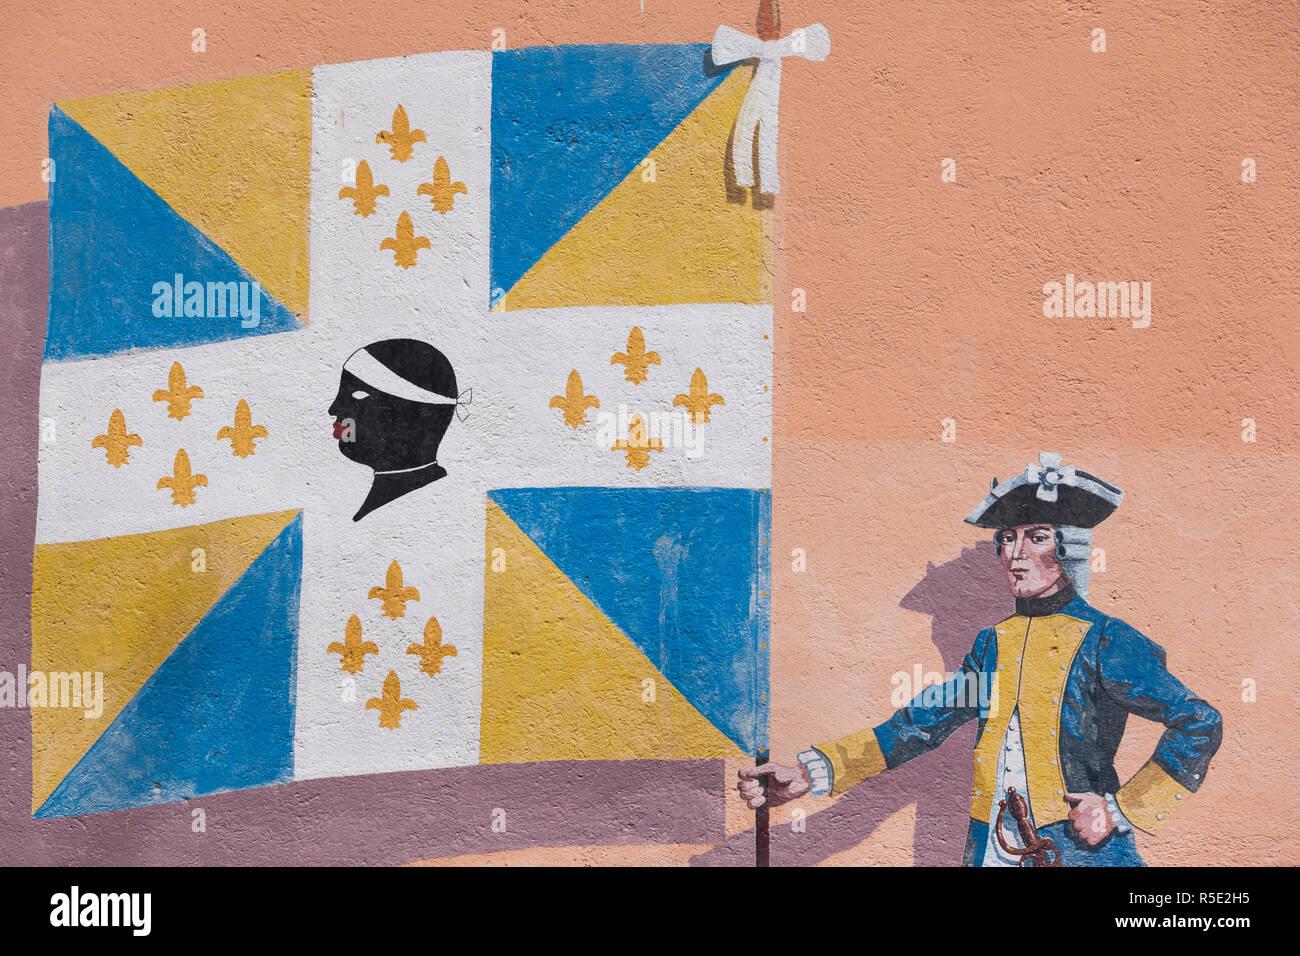 Corsican Flag Stock Photos & Corsican Flag Stock Images - Alamy